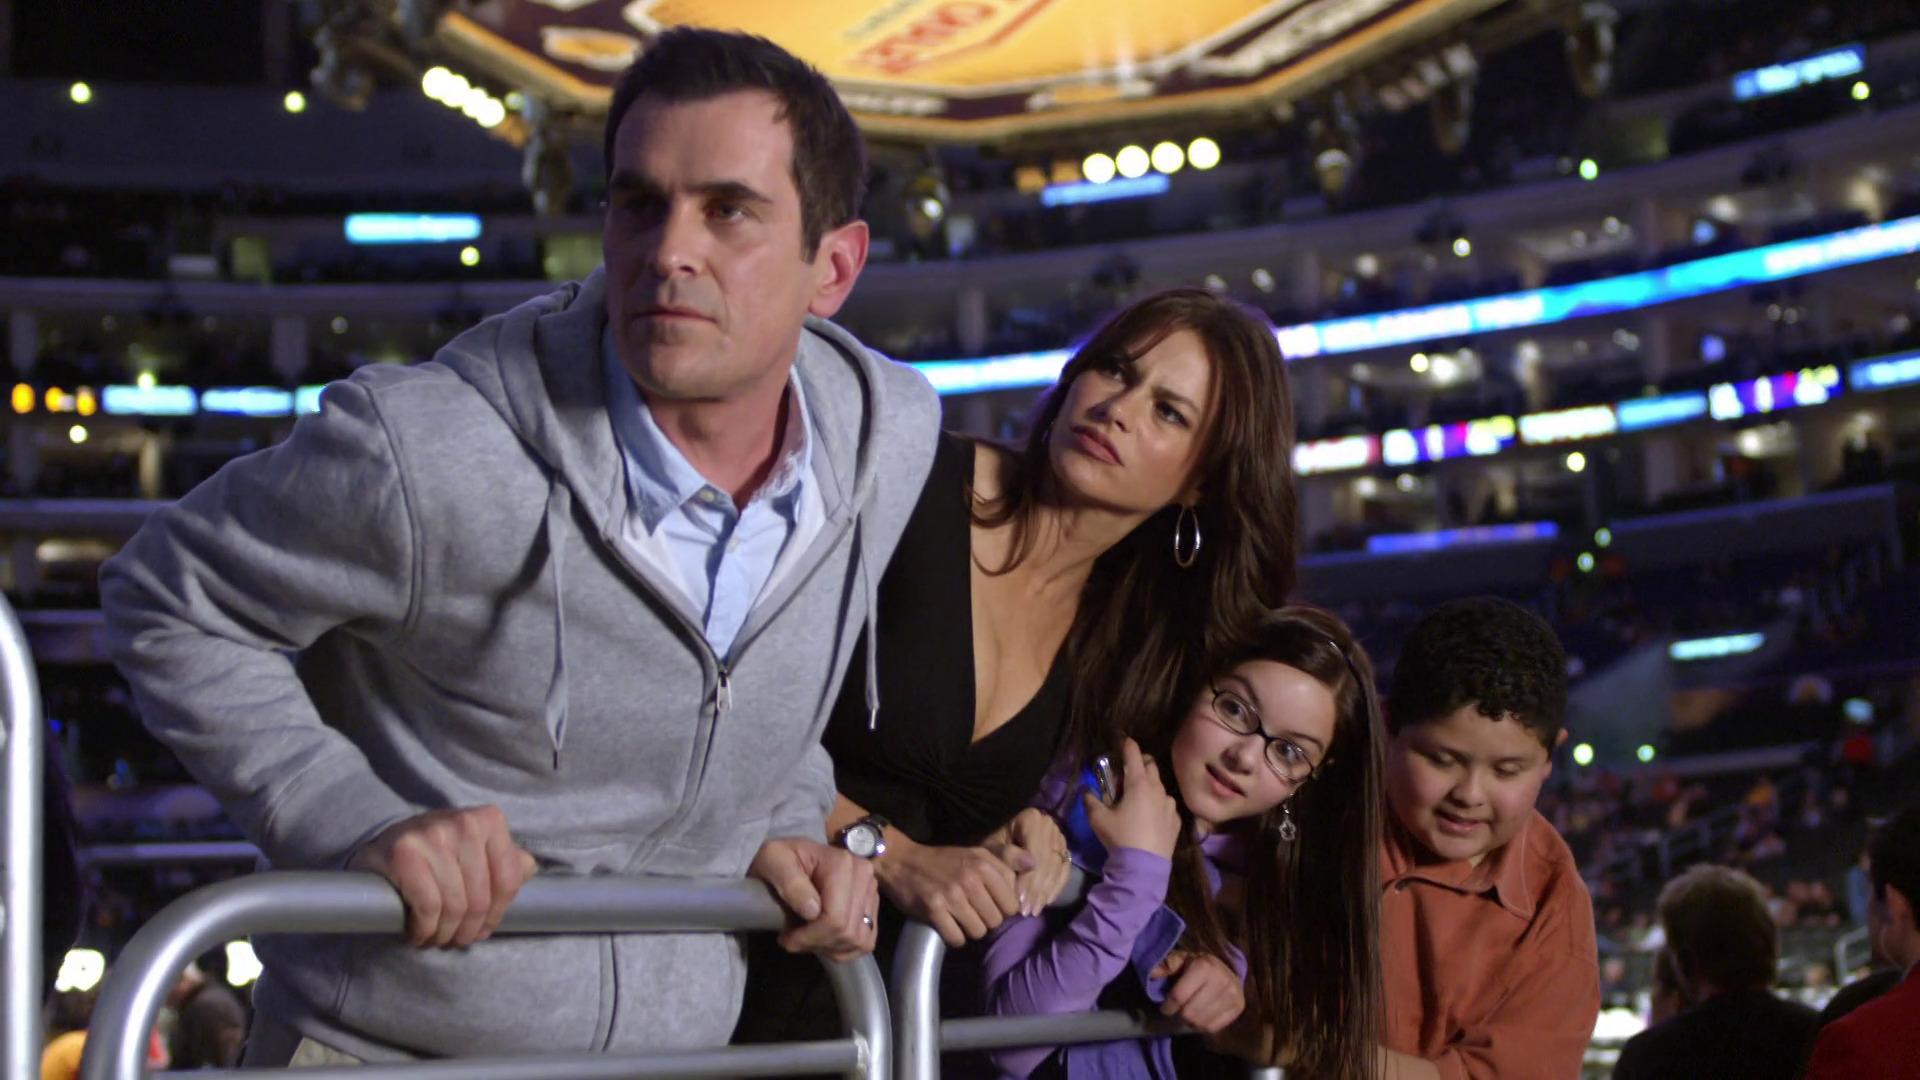 Temporada 1 T1 - C24: Retrato de familia